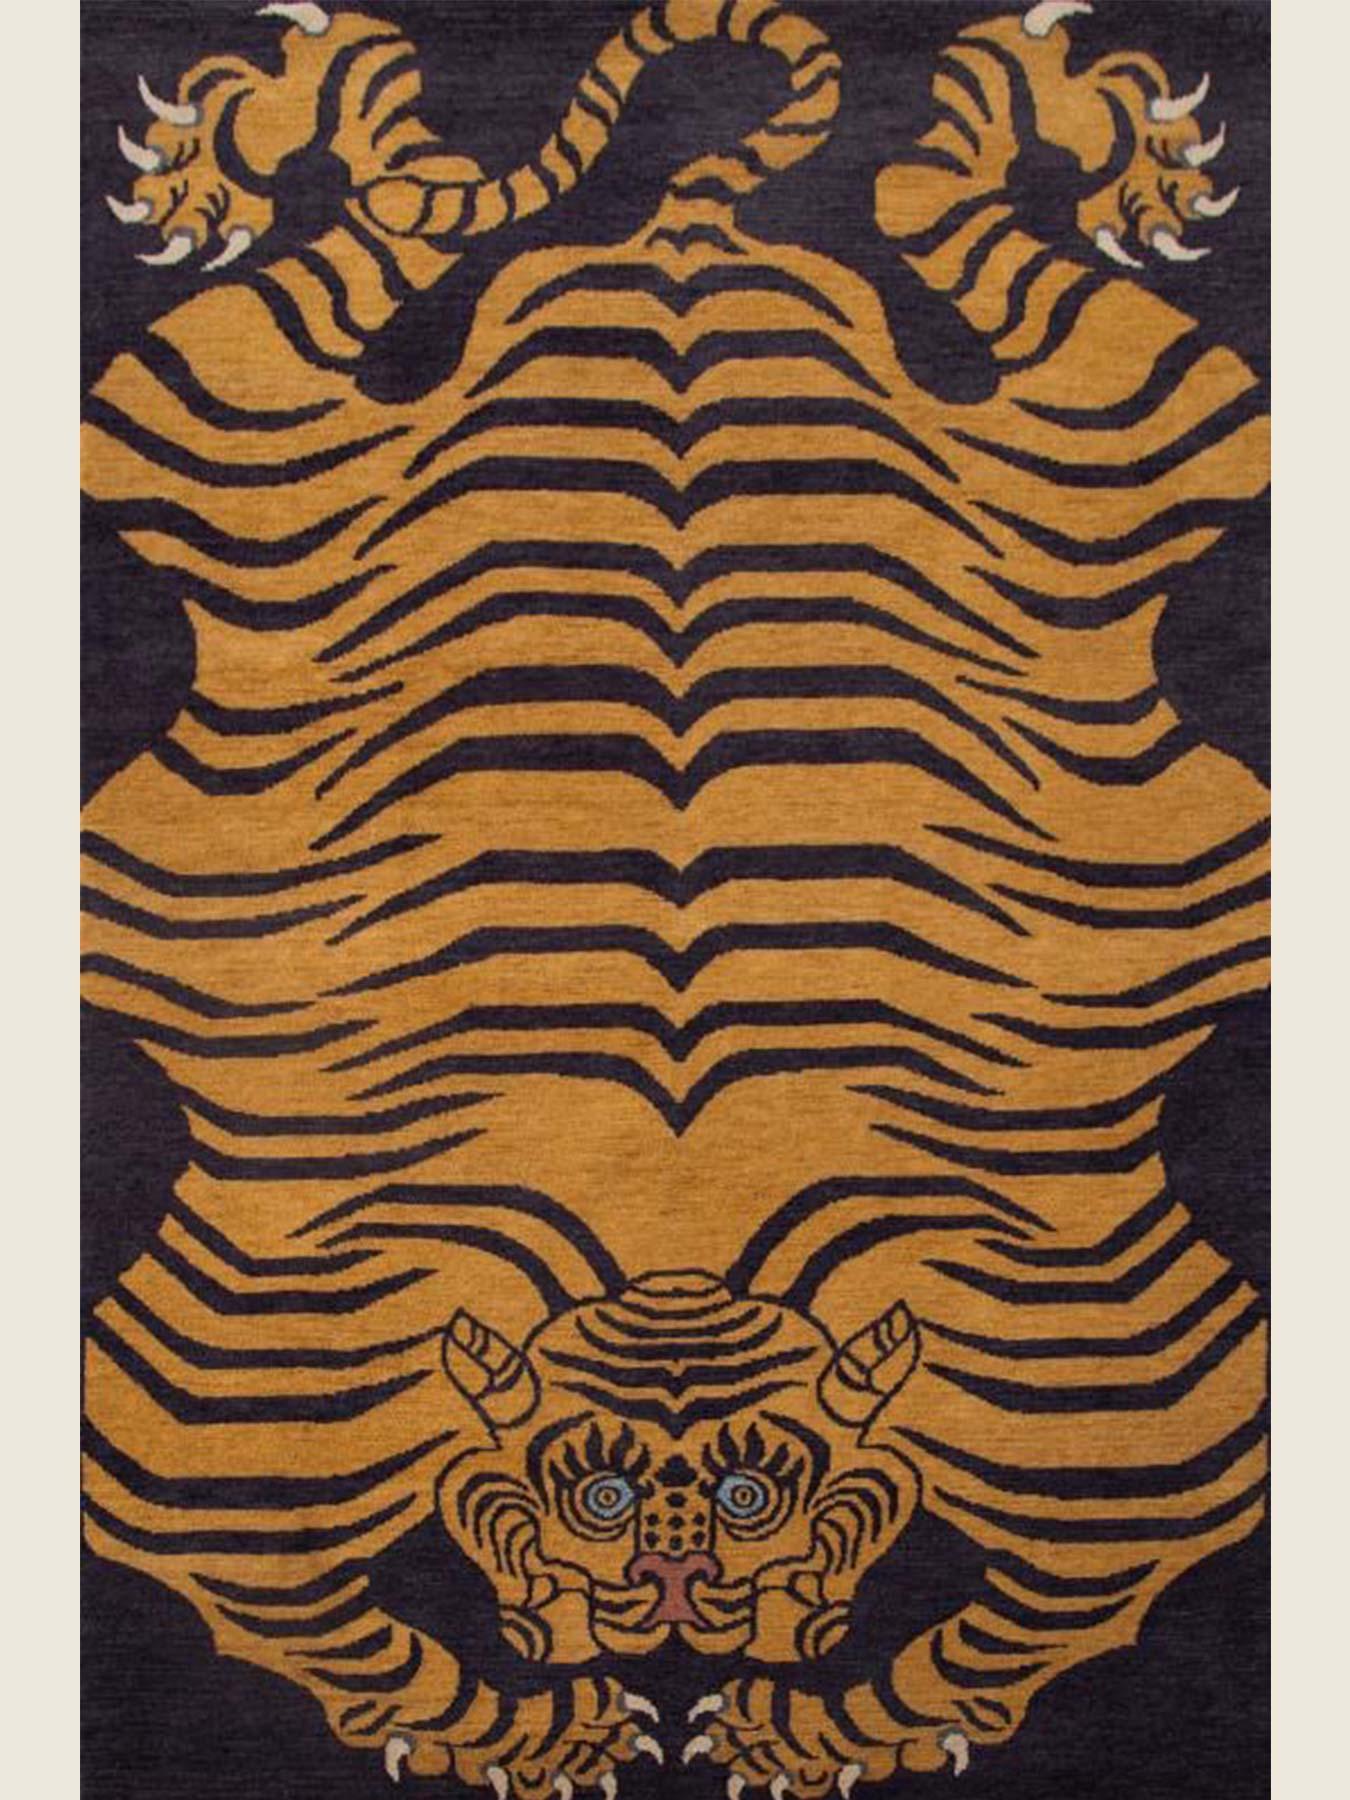 Tiger Auspicious And Luck zt-02